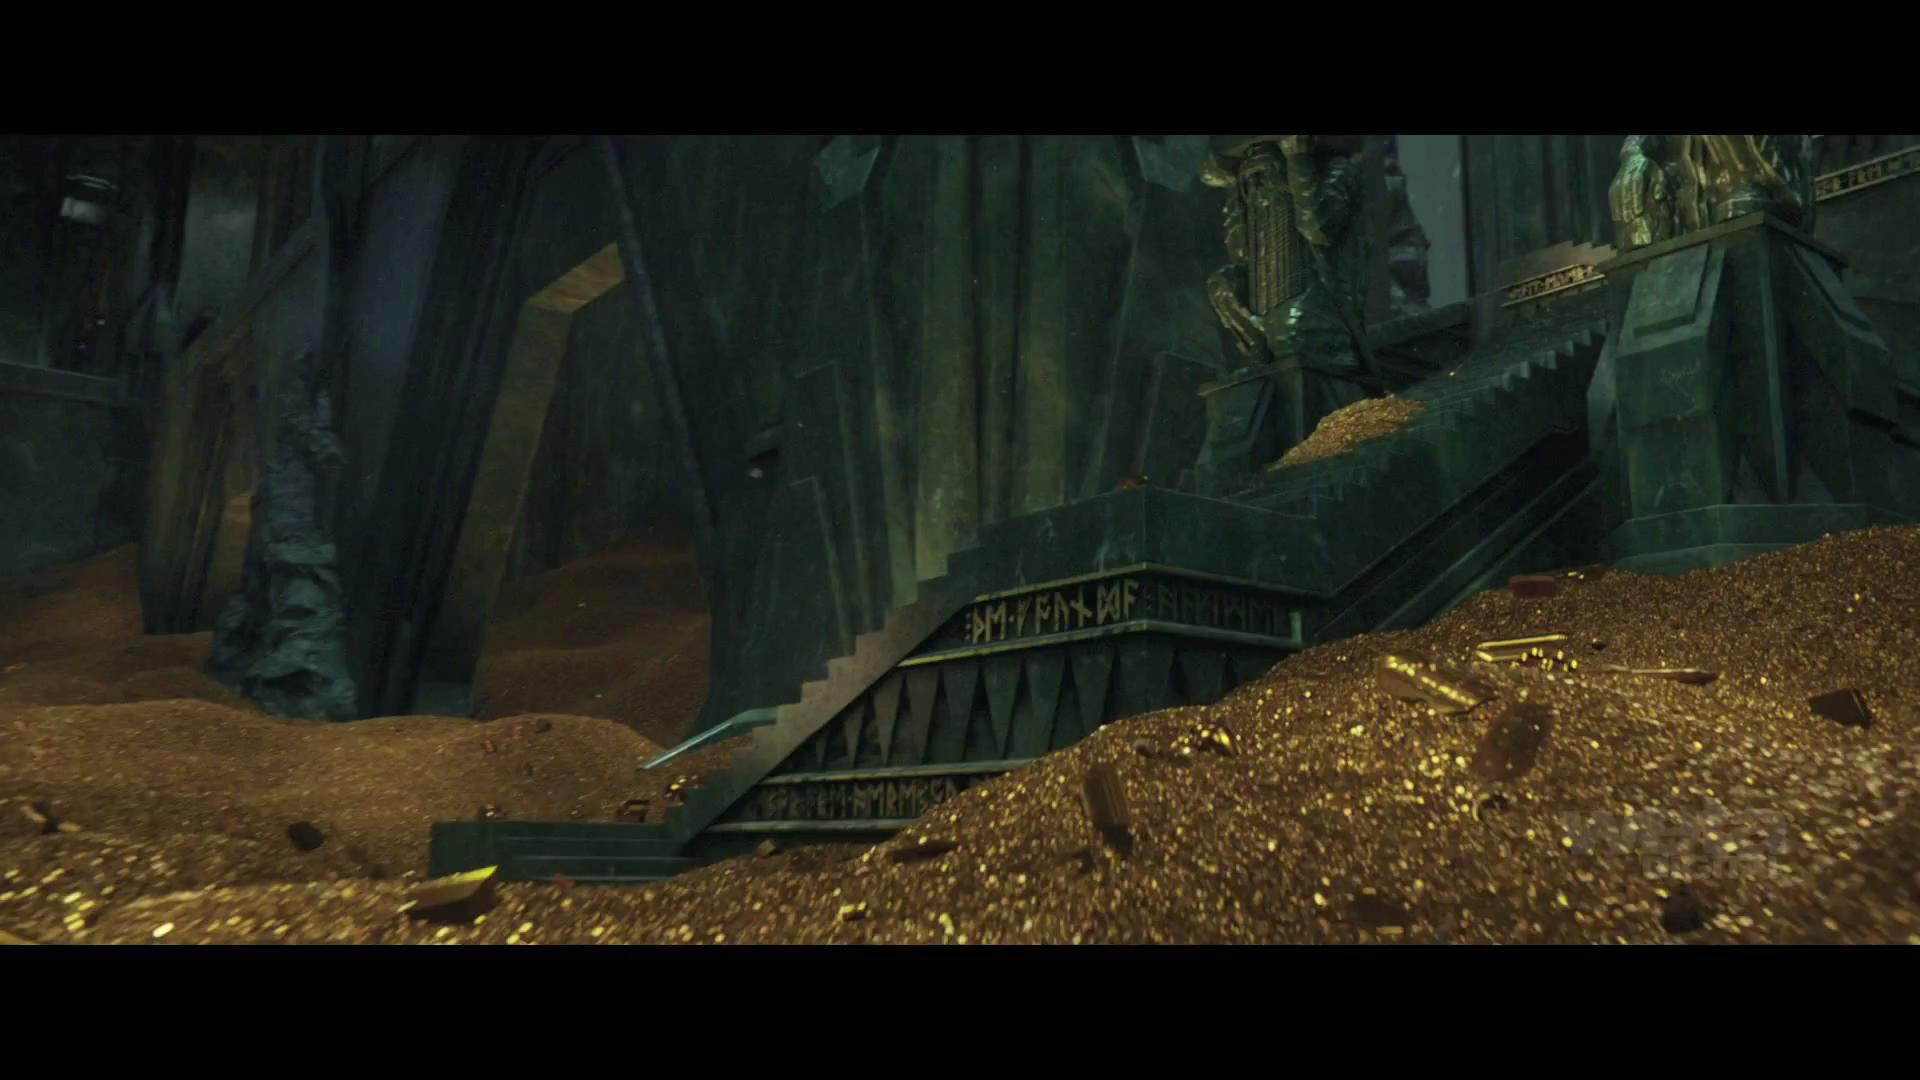 Erebor The Hobbit Movie 1920x1080